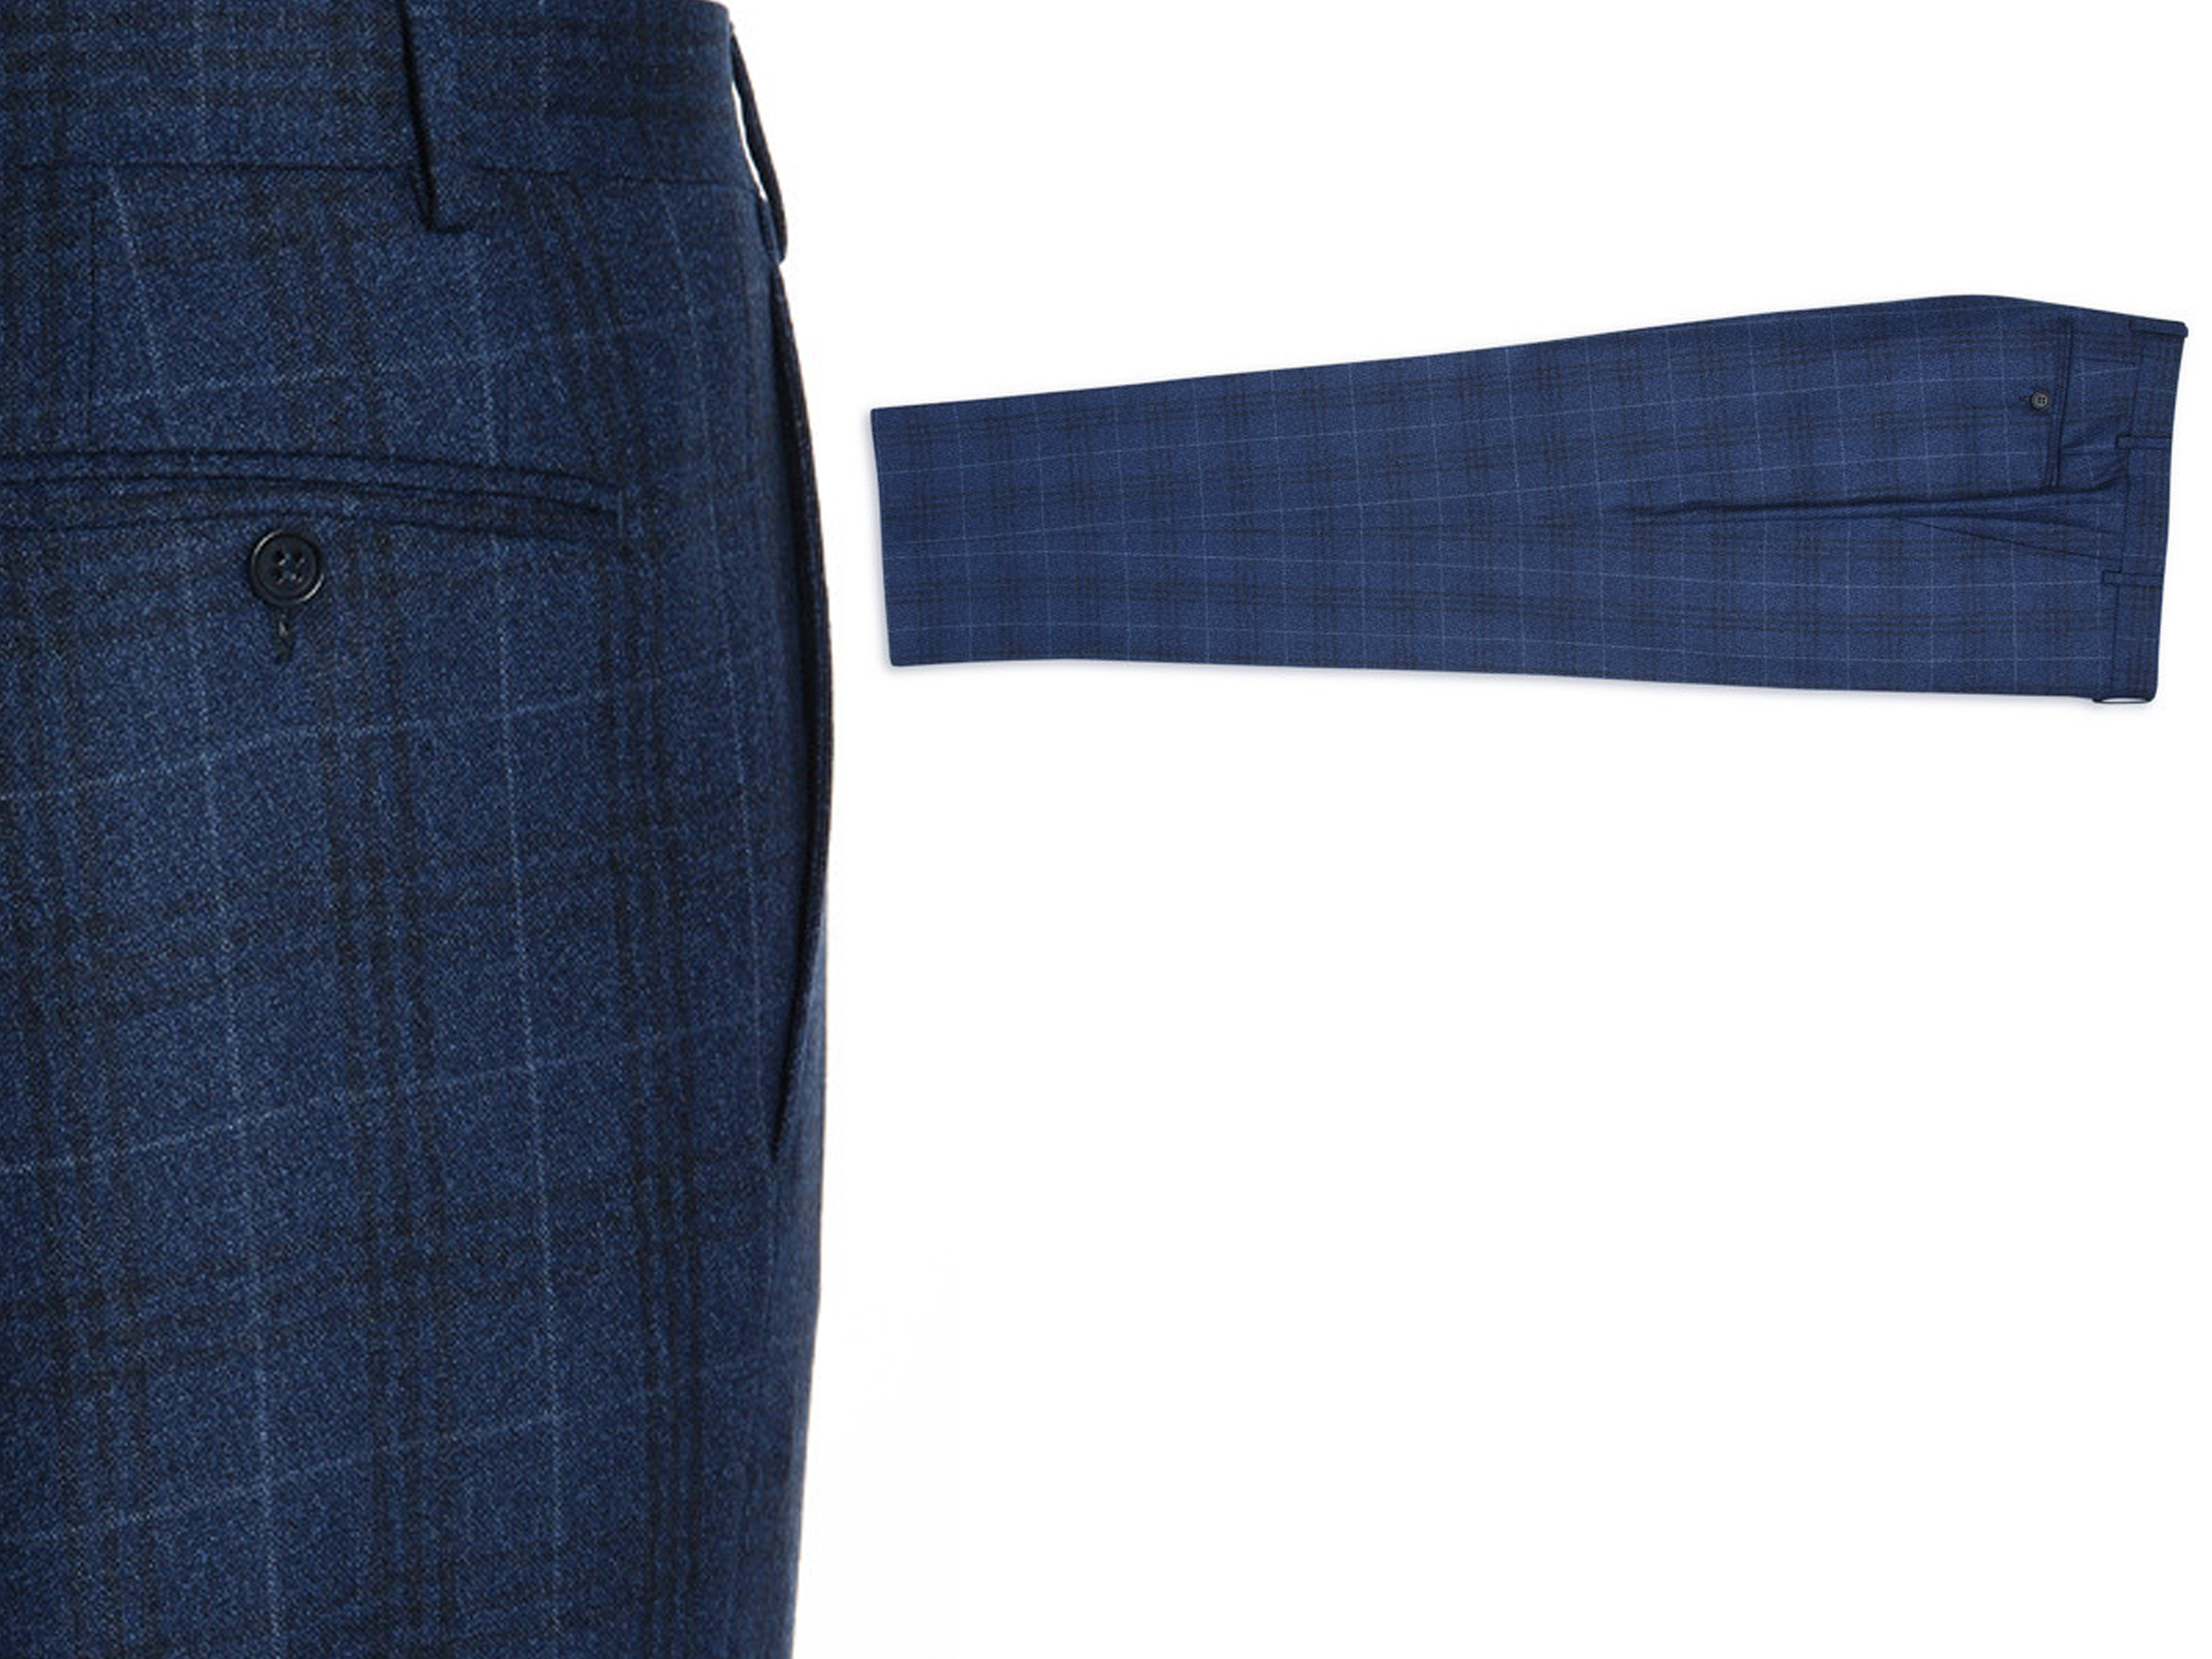 Canali Mens Tailoring